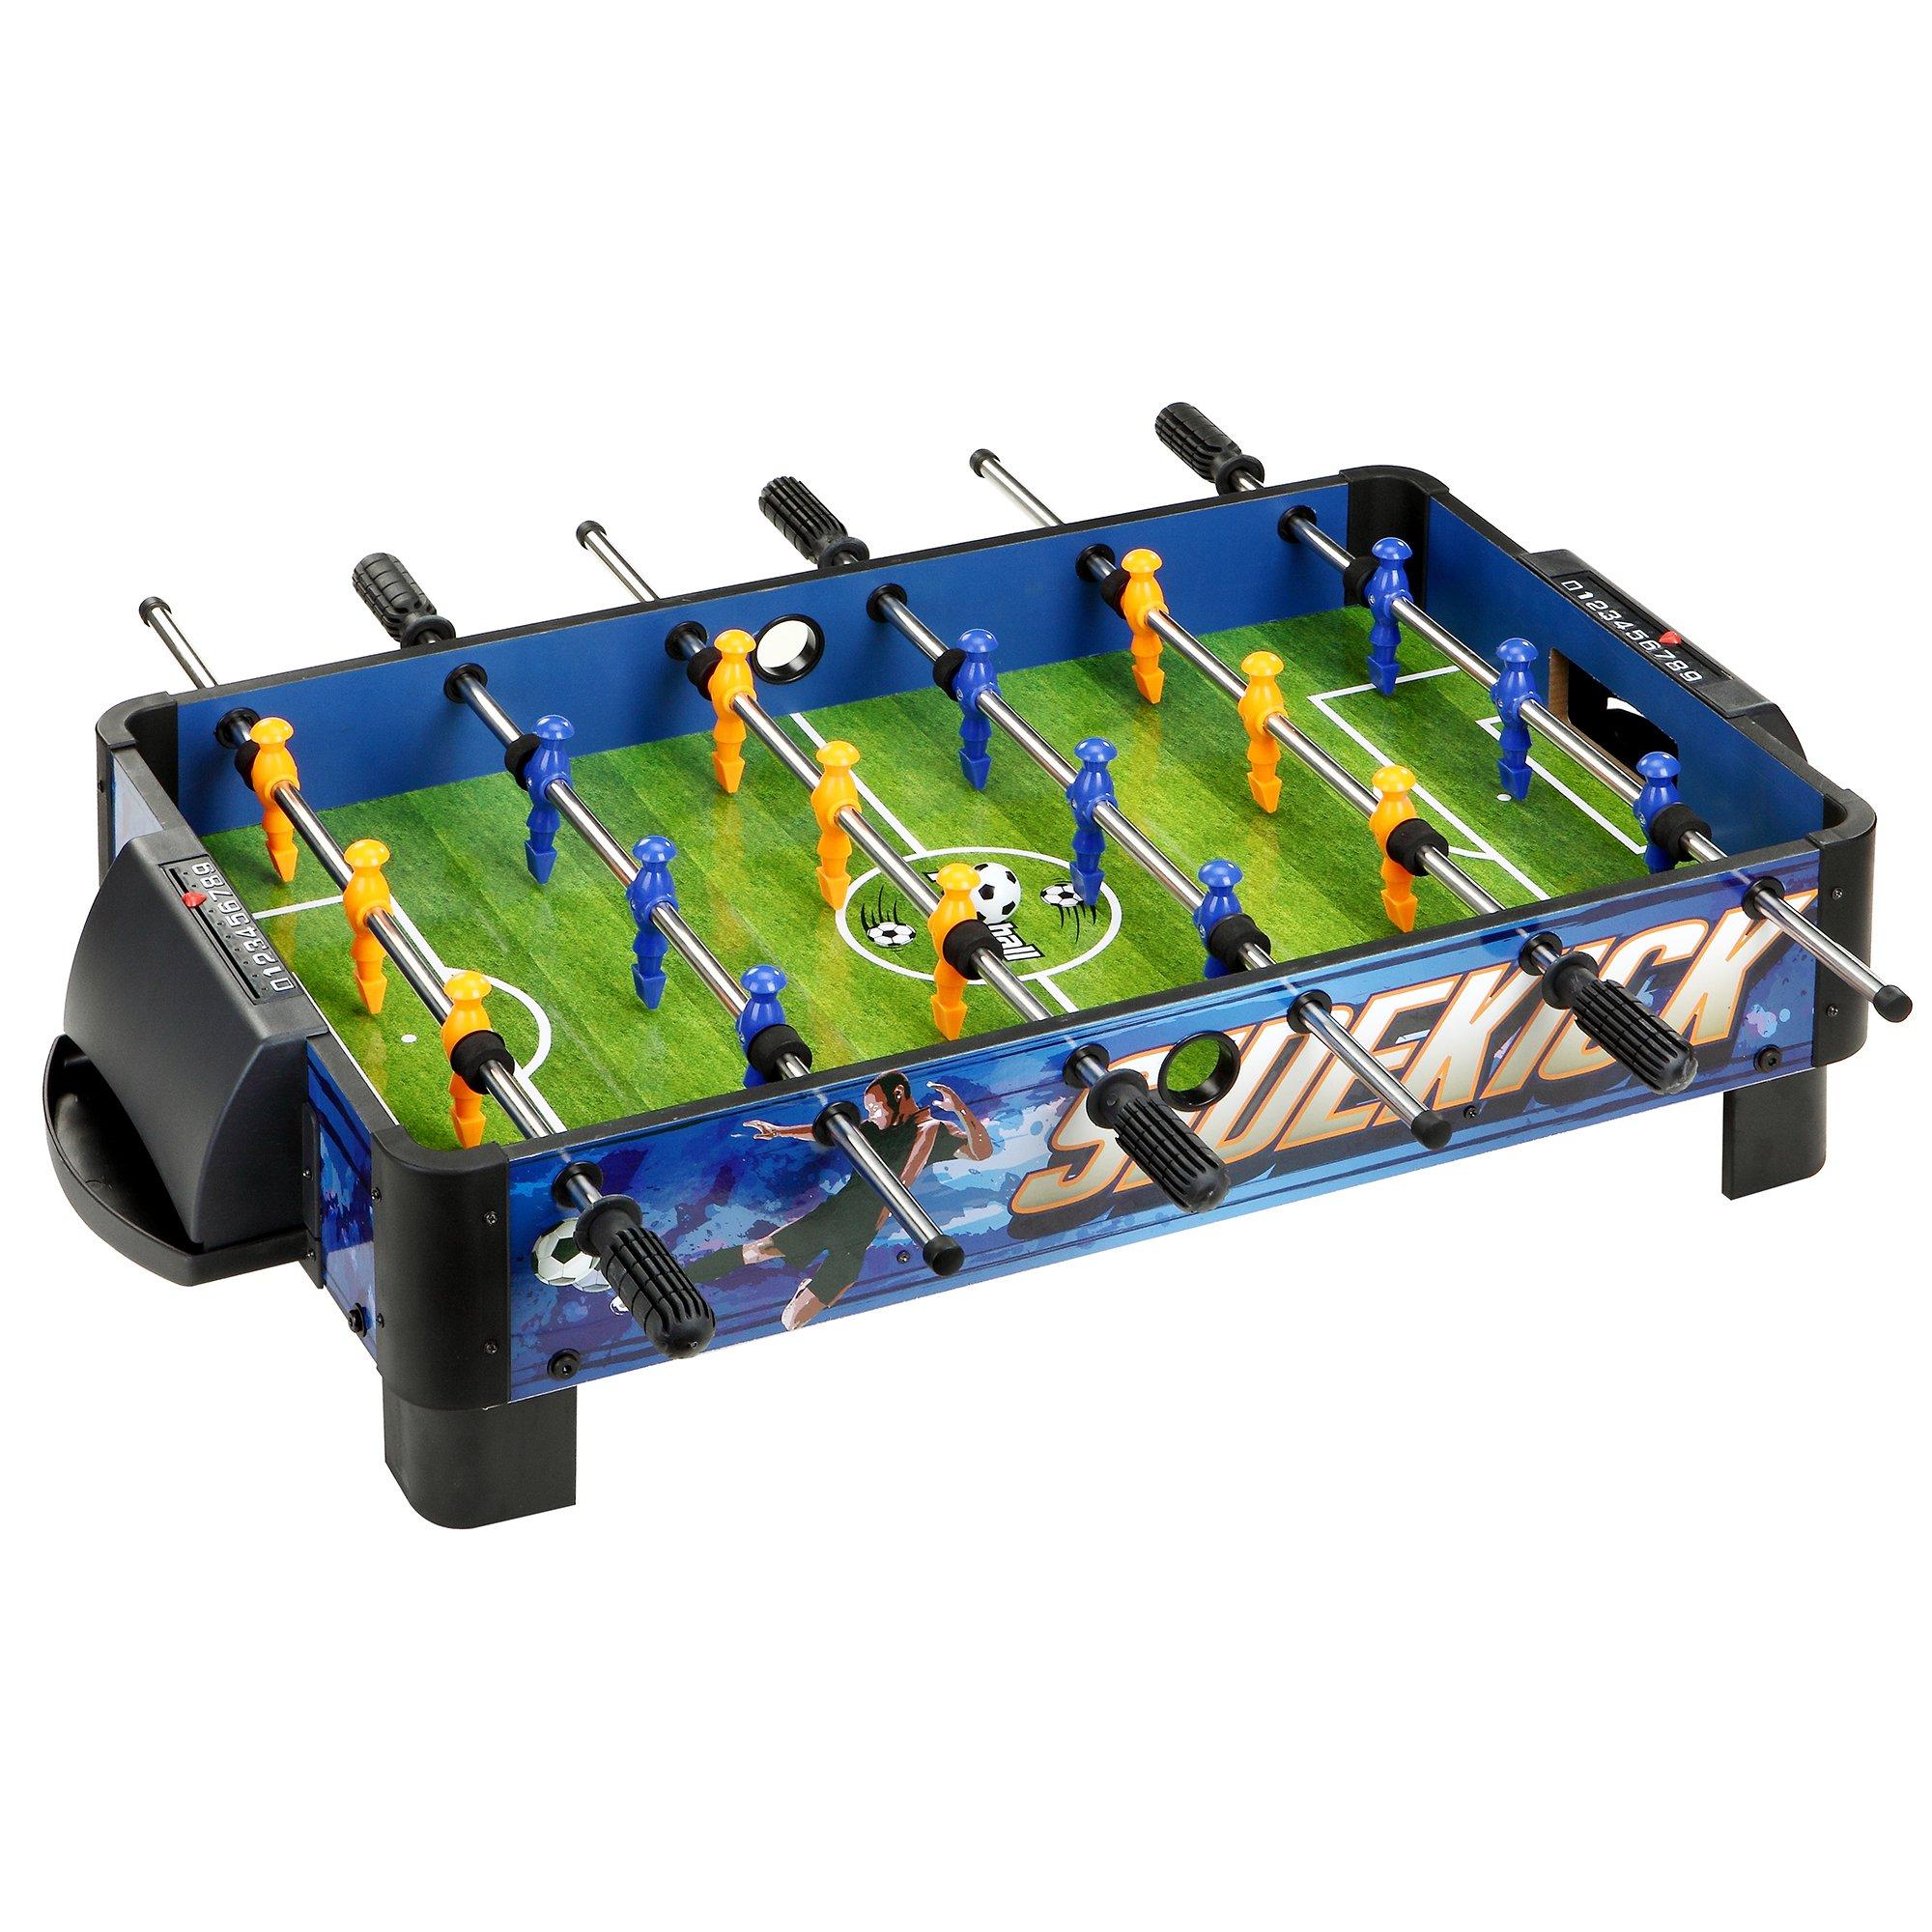 Hathaway BG1028T Sidekick Portable Foosball Table for Tabletops, 38'', Blue/Green//Yellow by Hathaway